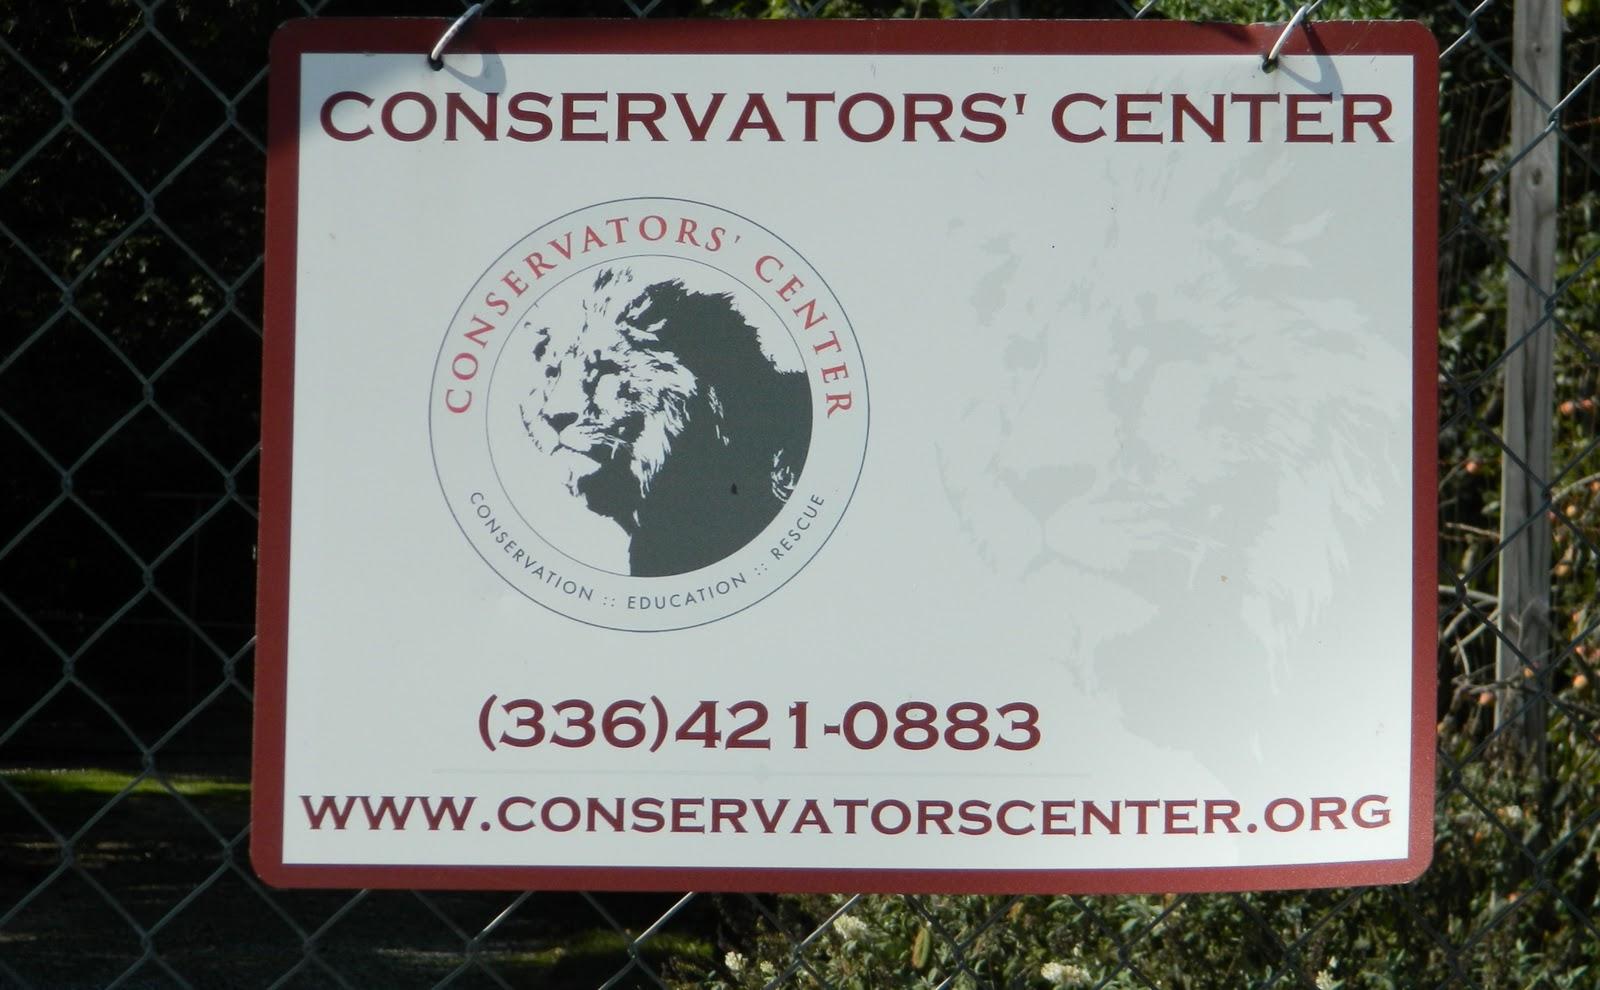 conservator's center